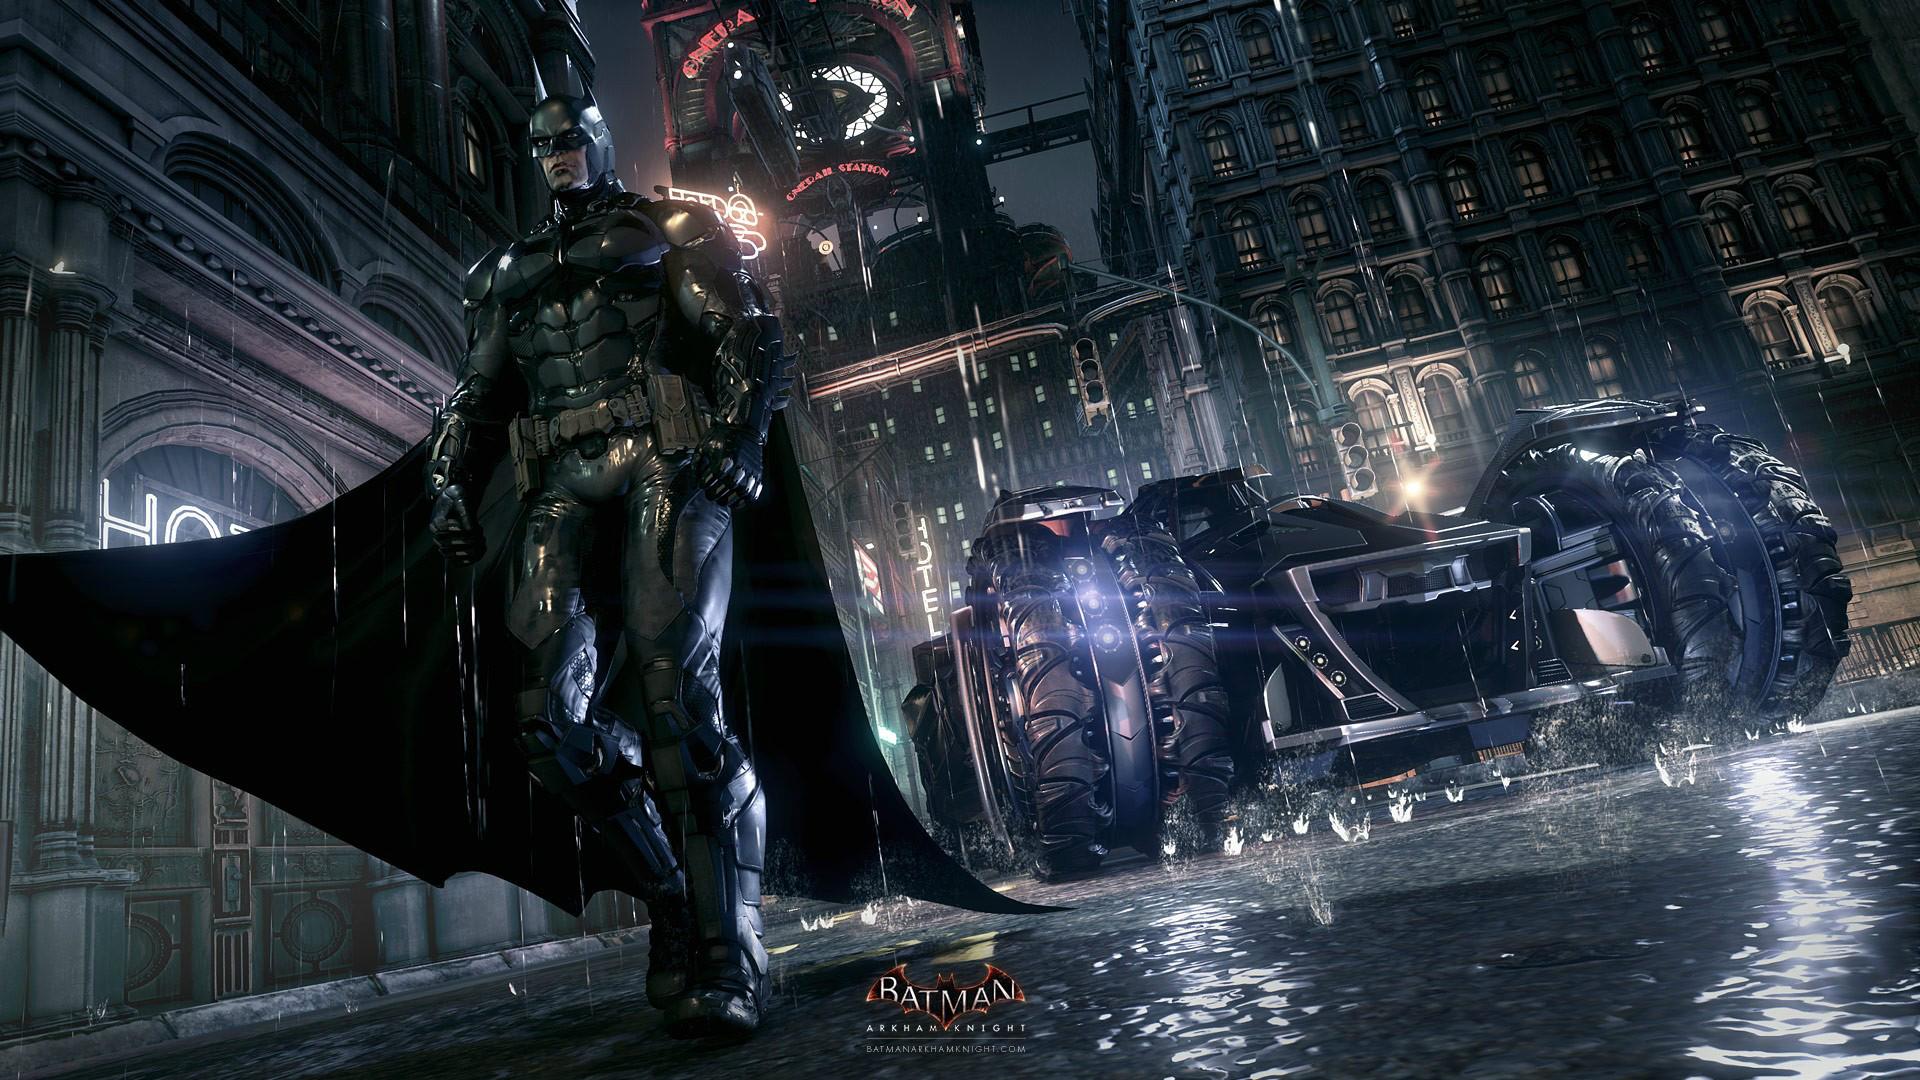 new batmobile batman arkham knight game hd 1920x1080 1080p wallpaper 1920x1080